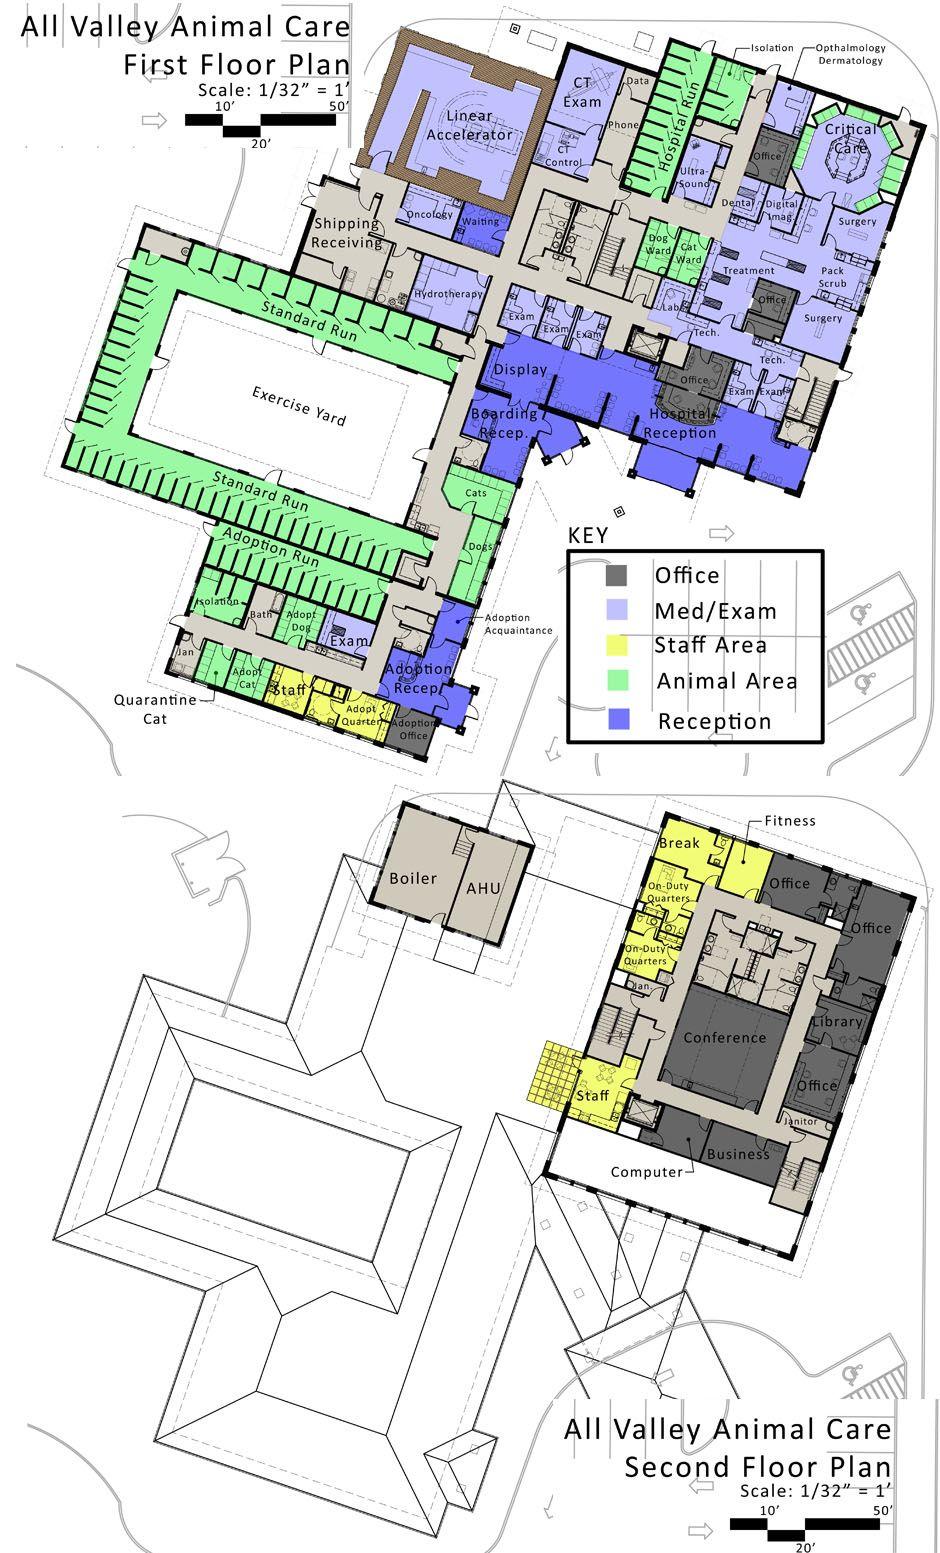 Veterinary Floor Plan All Valley Animal Care Center Animal Care Pinterest Animal